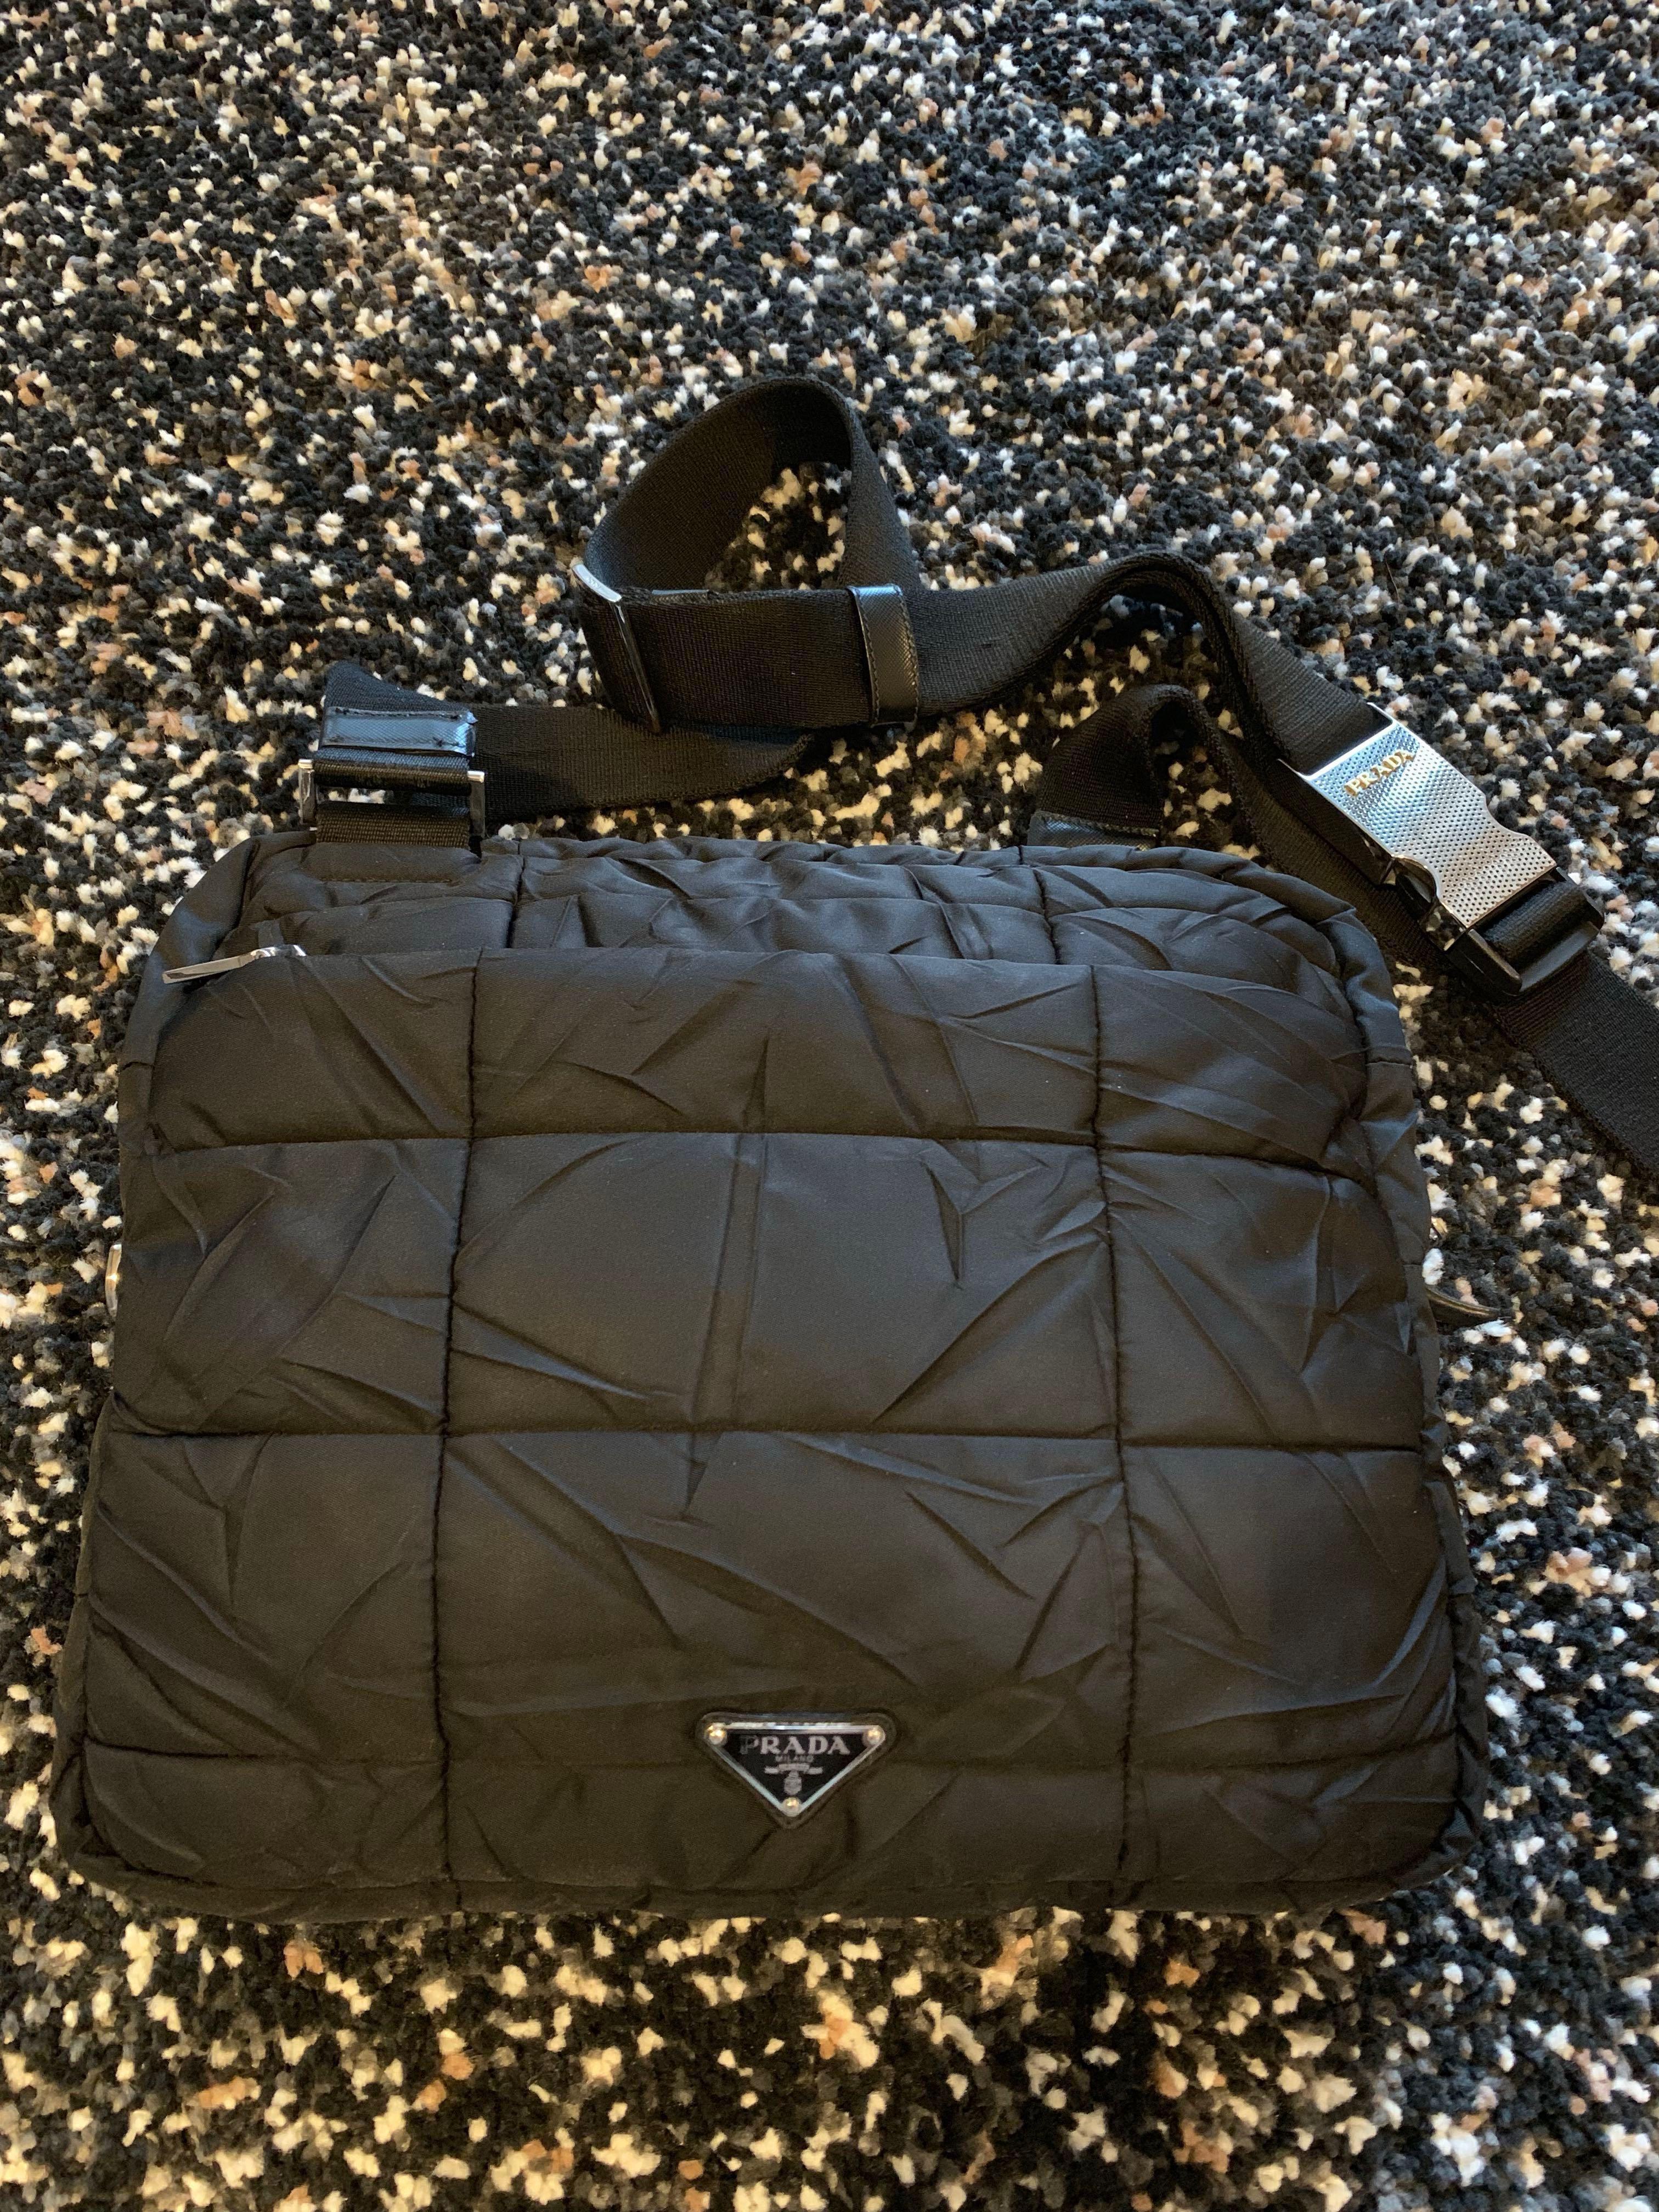 9c4cf1de816e Prada Black Quilted Nylon Messenger Sling Bag, Luxury, Bags ...